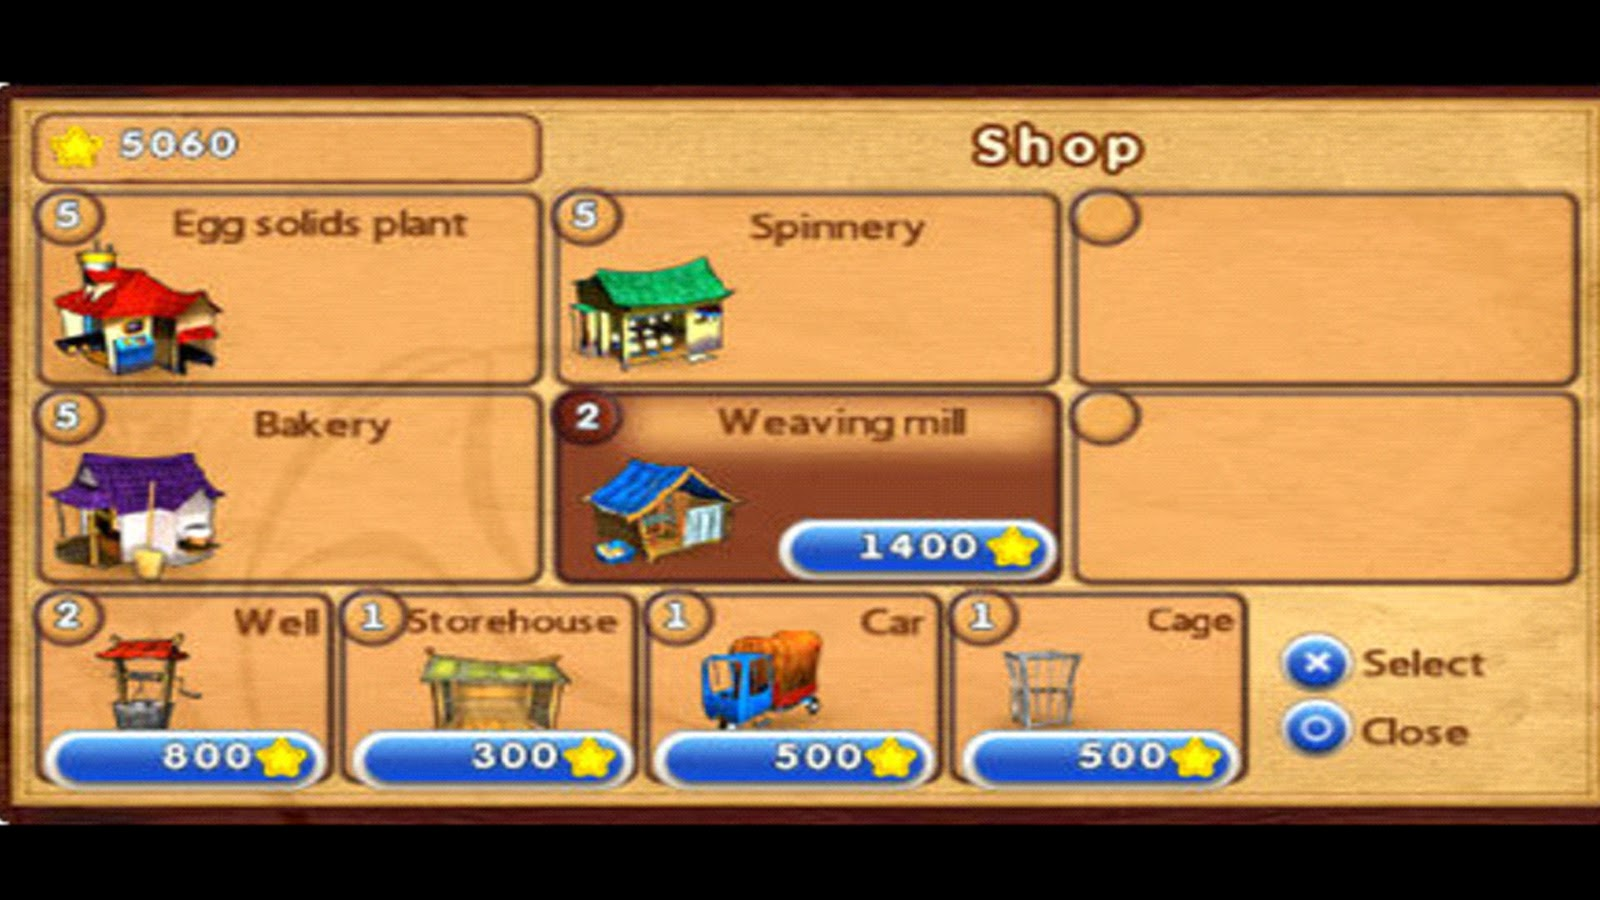 Psp Farm Games Free Download